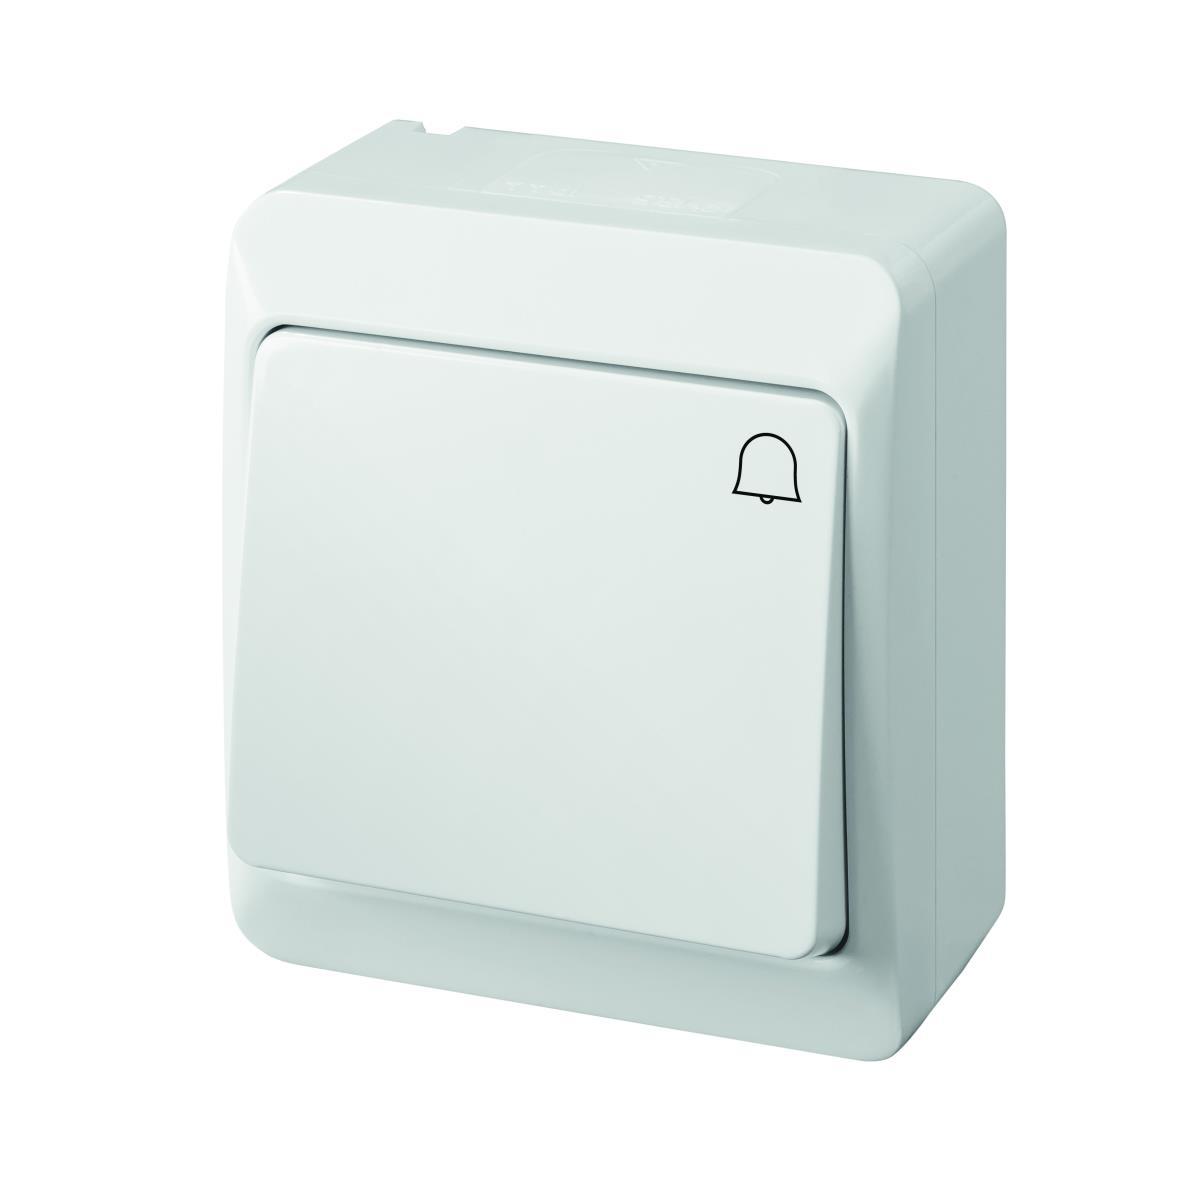 Aufputz Klingel Taster 10 A 230 V IP44 Farbe weiß HERMES,Elektro-Plast,0337-02, 5901130484027